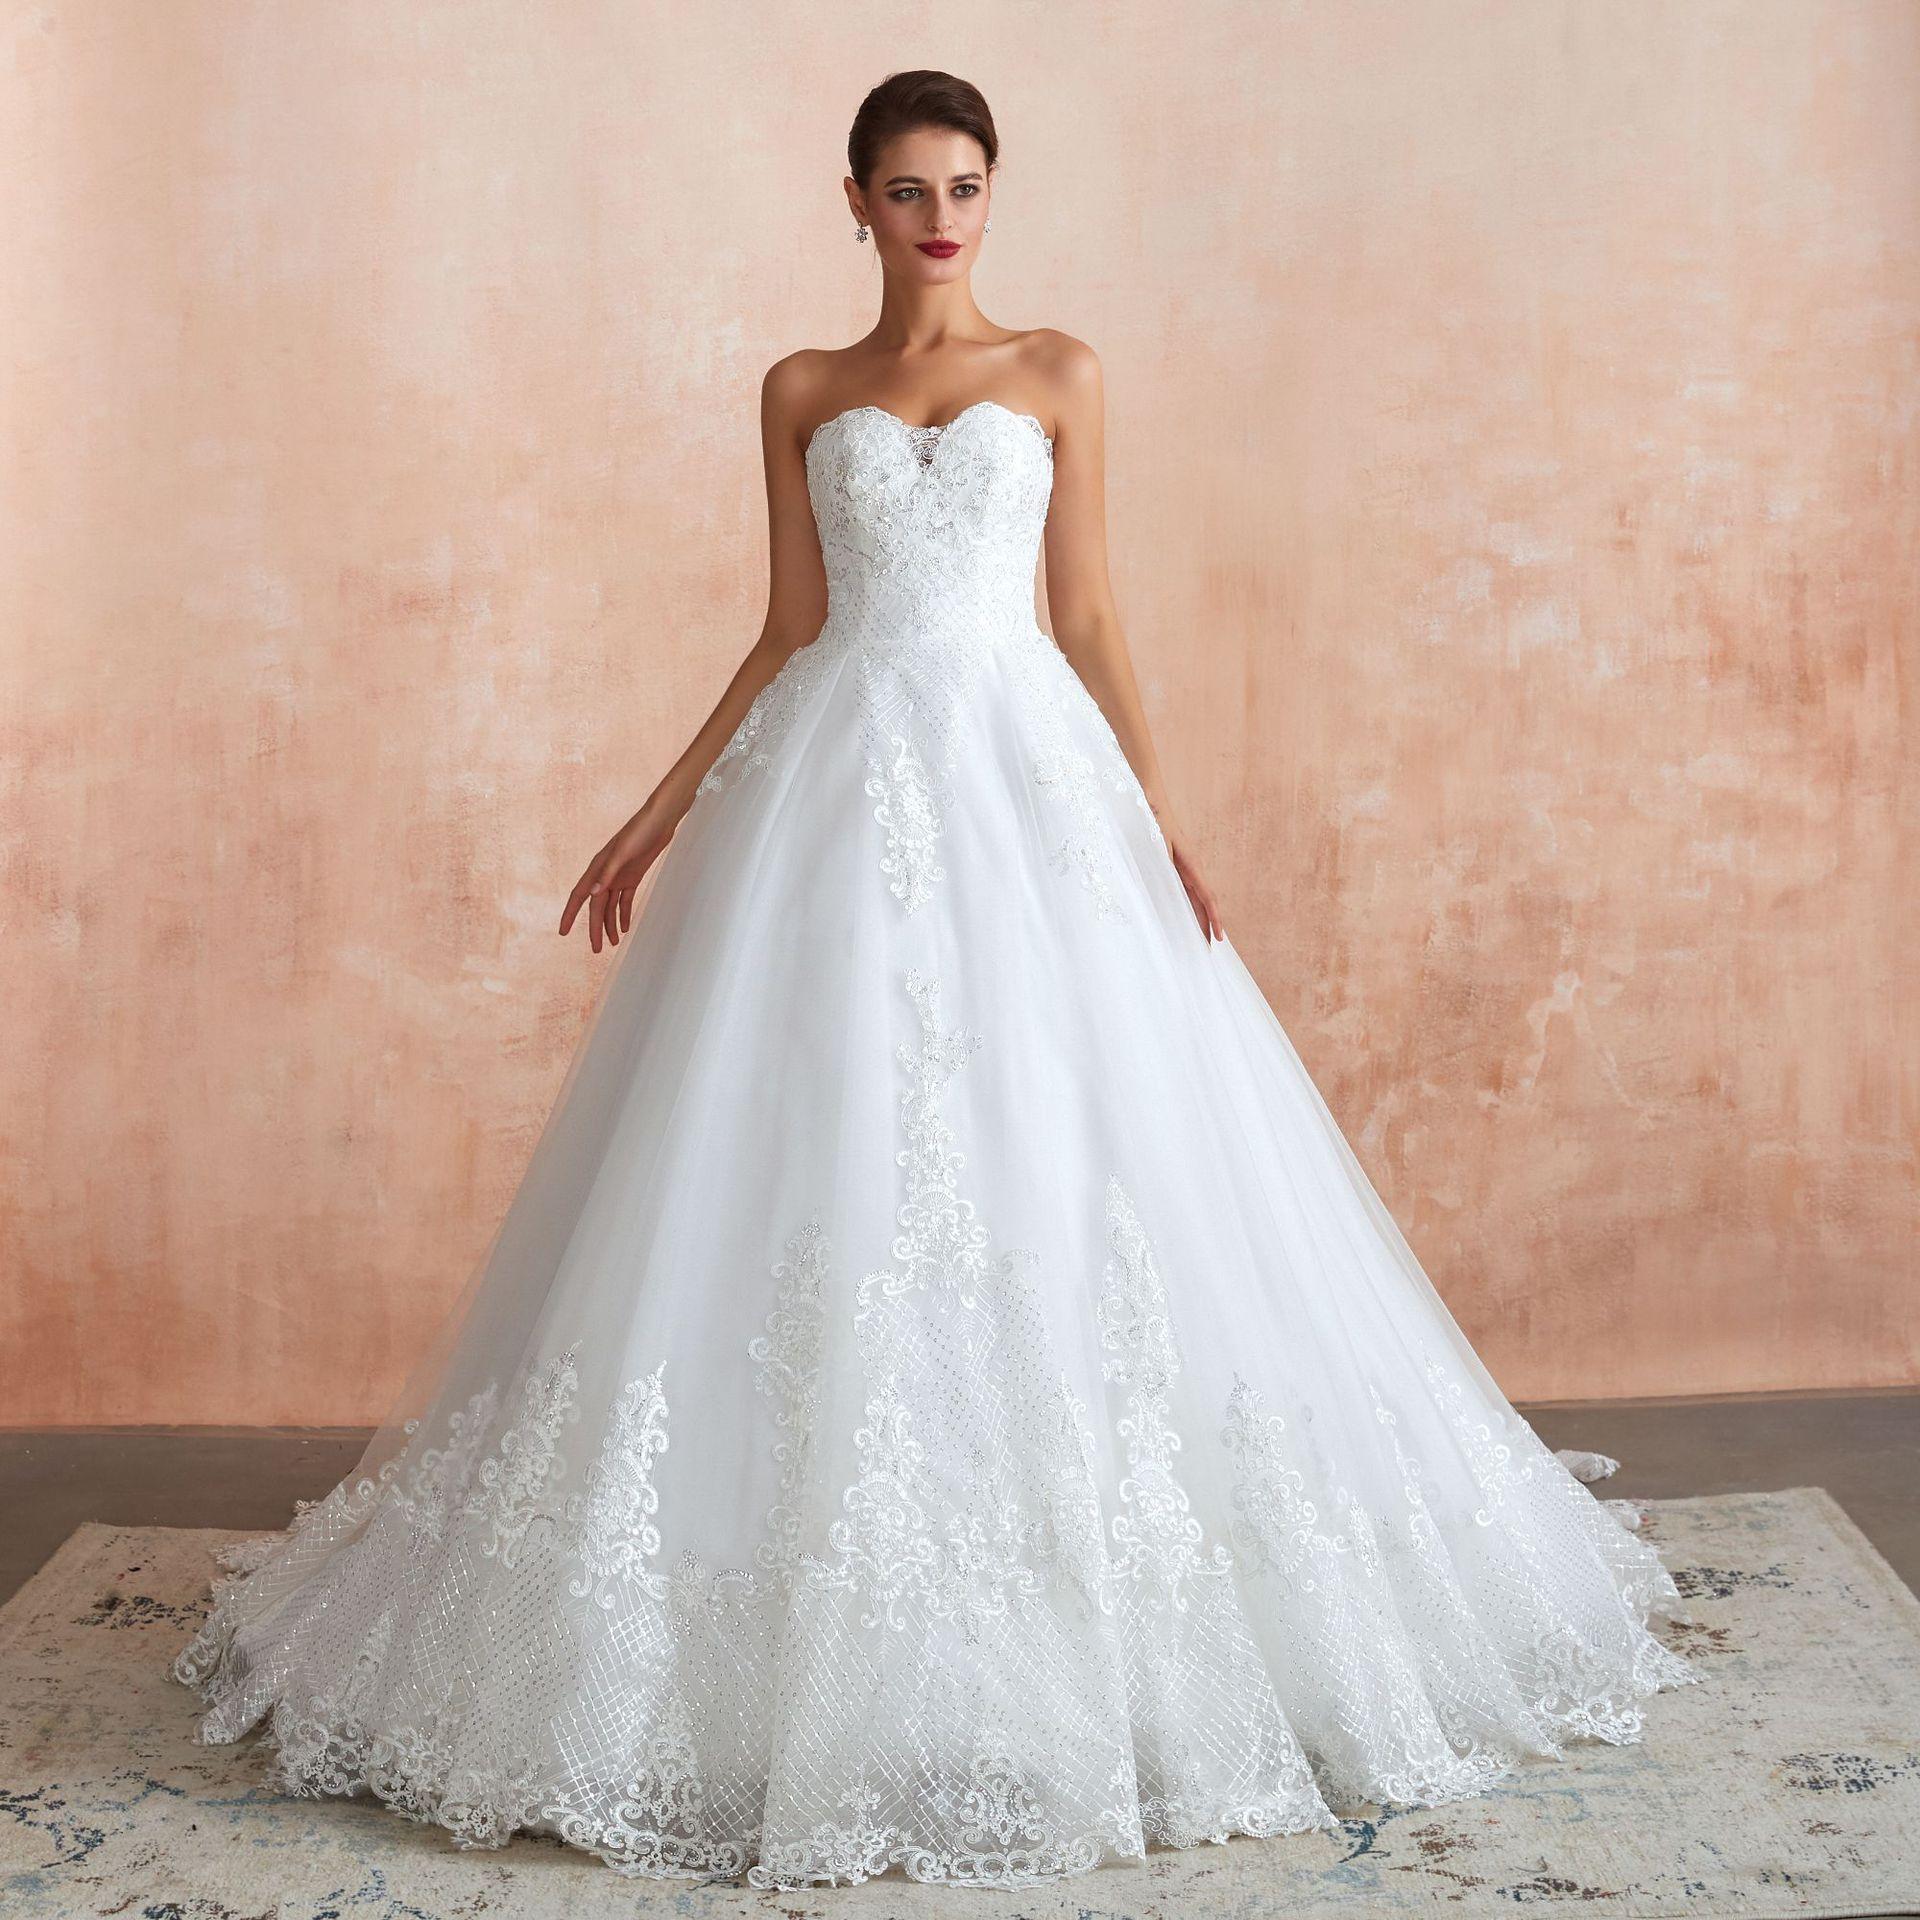 Wedding Dresses Vestidos De Novia Sweetheart Court Train Lace Applique Corset Wedding Dress Gowns Robe De Mariage